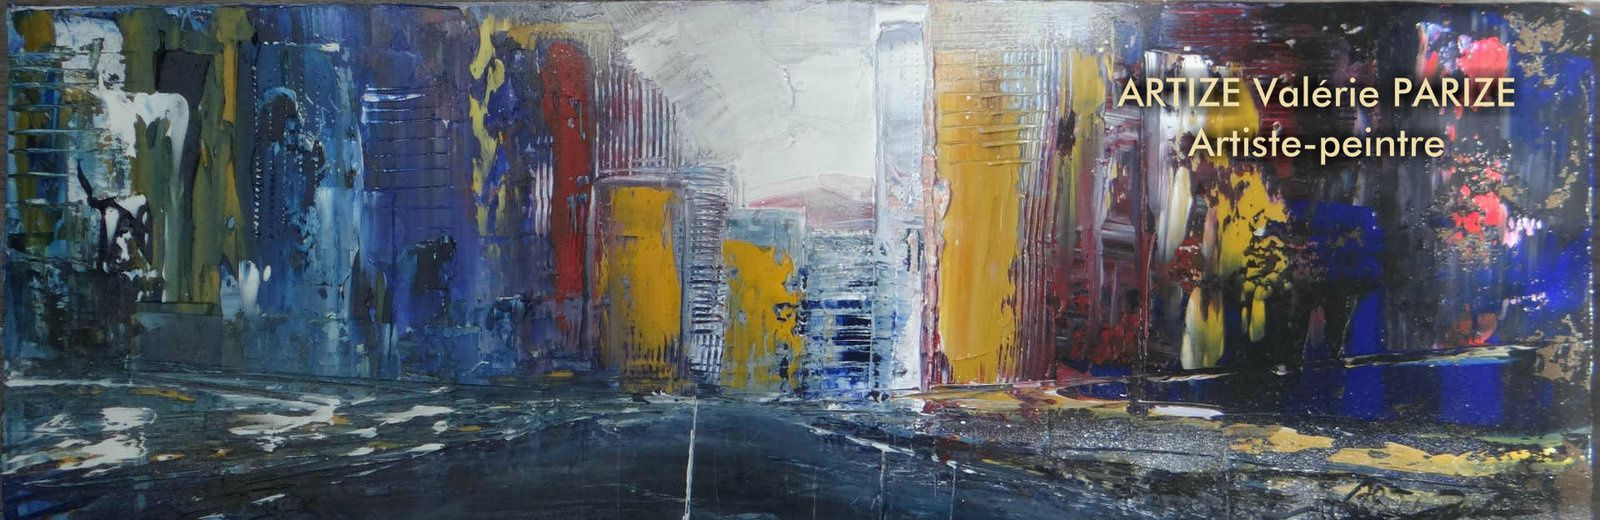 Panorama, huile sur toile, 30x90, prix 280 euros